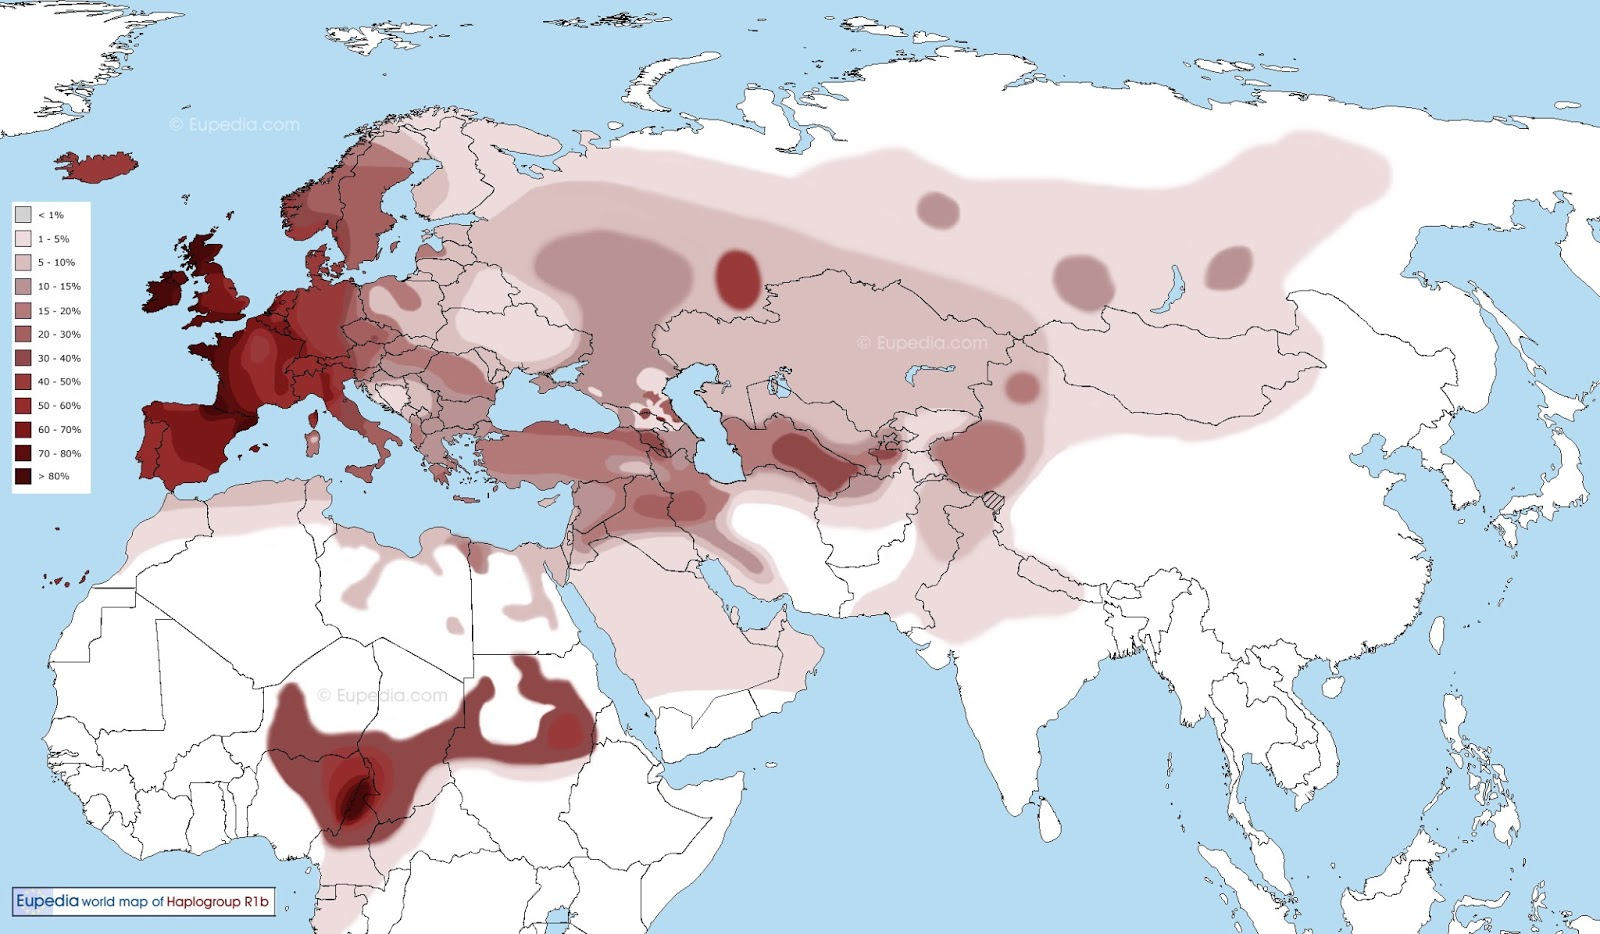 Haplogroup R1b across the World